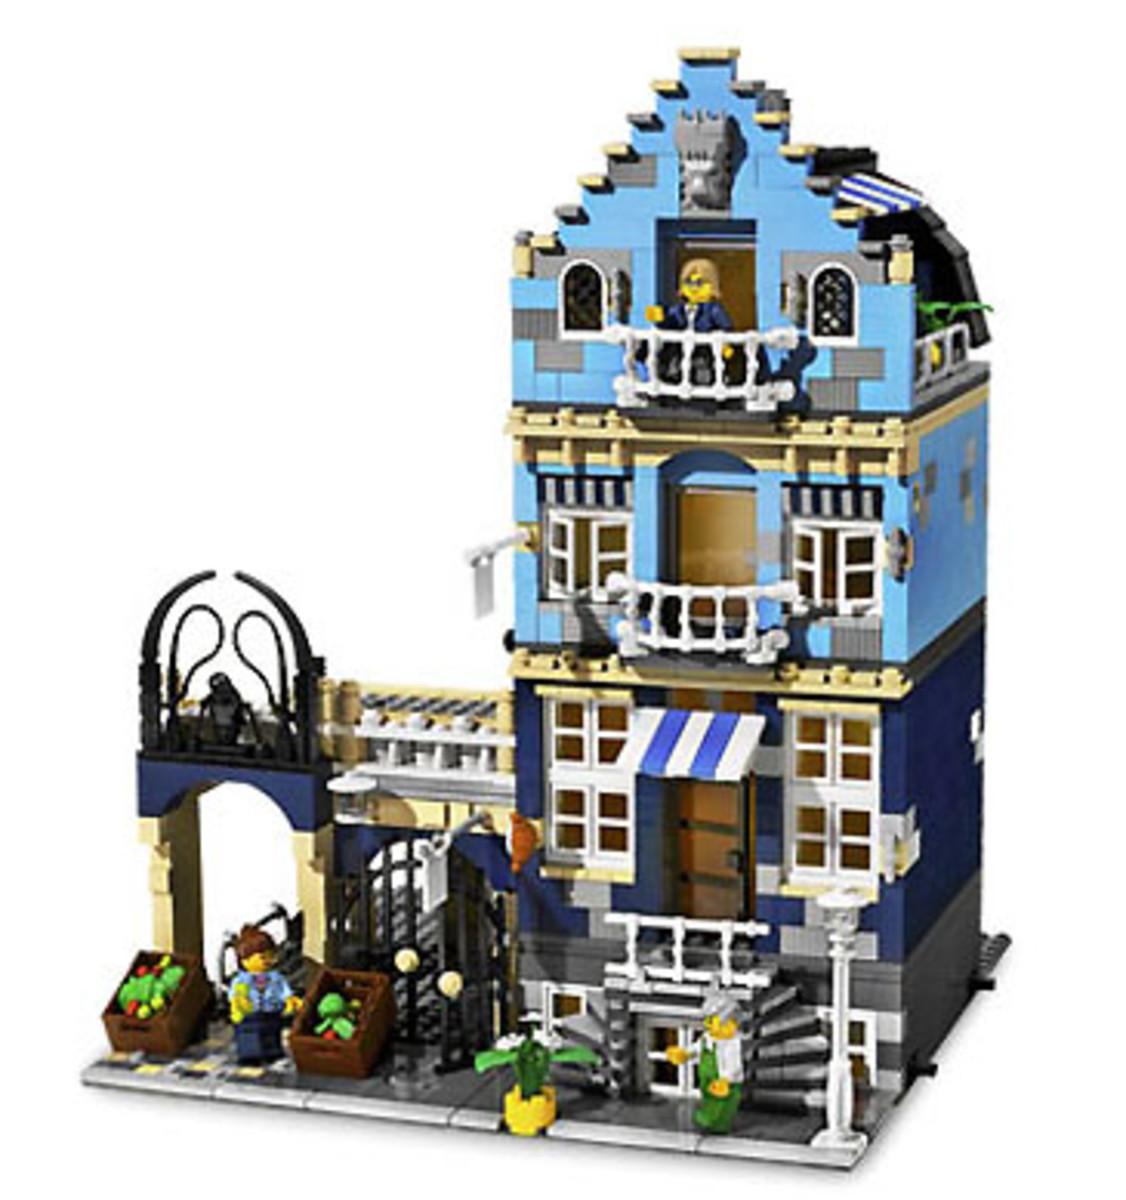 Market Street (10190) Released 2007. 1,236 pieces.